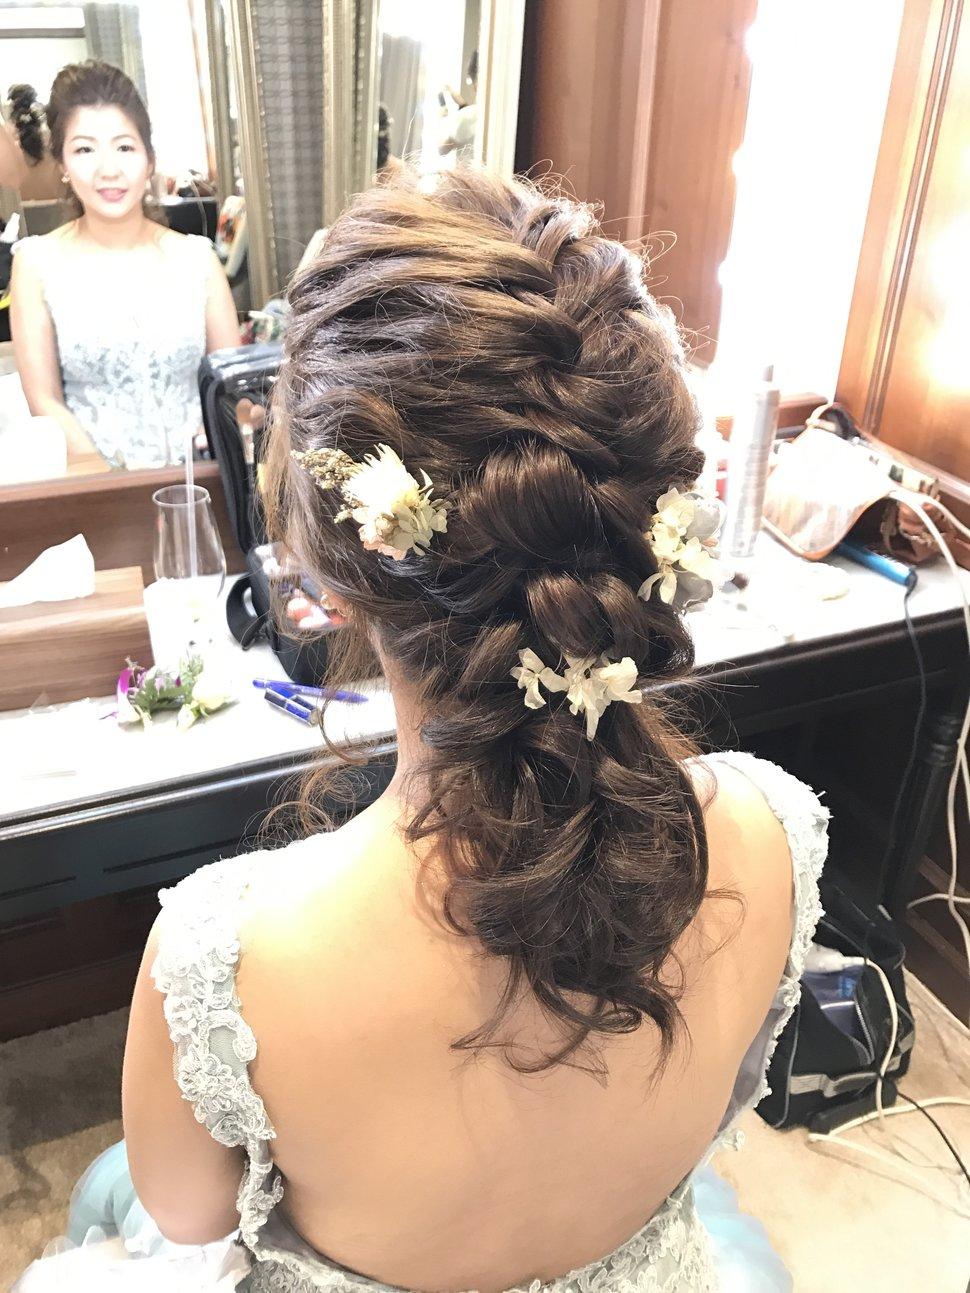 IMG_3016 - 新秘Heidi's style(新北市) - 結婚吧一站式婚禮服務平台